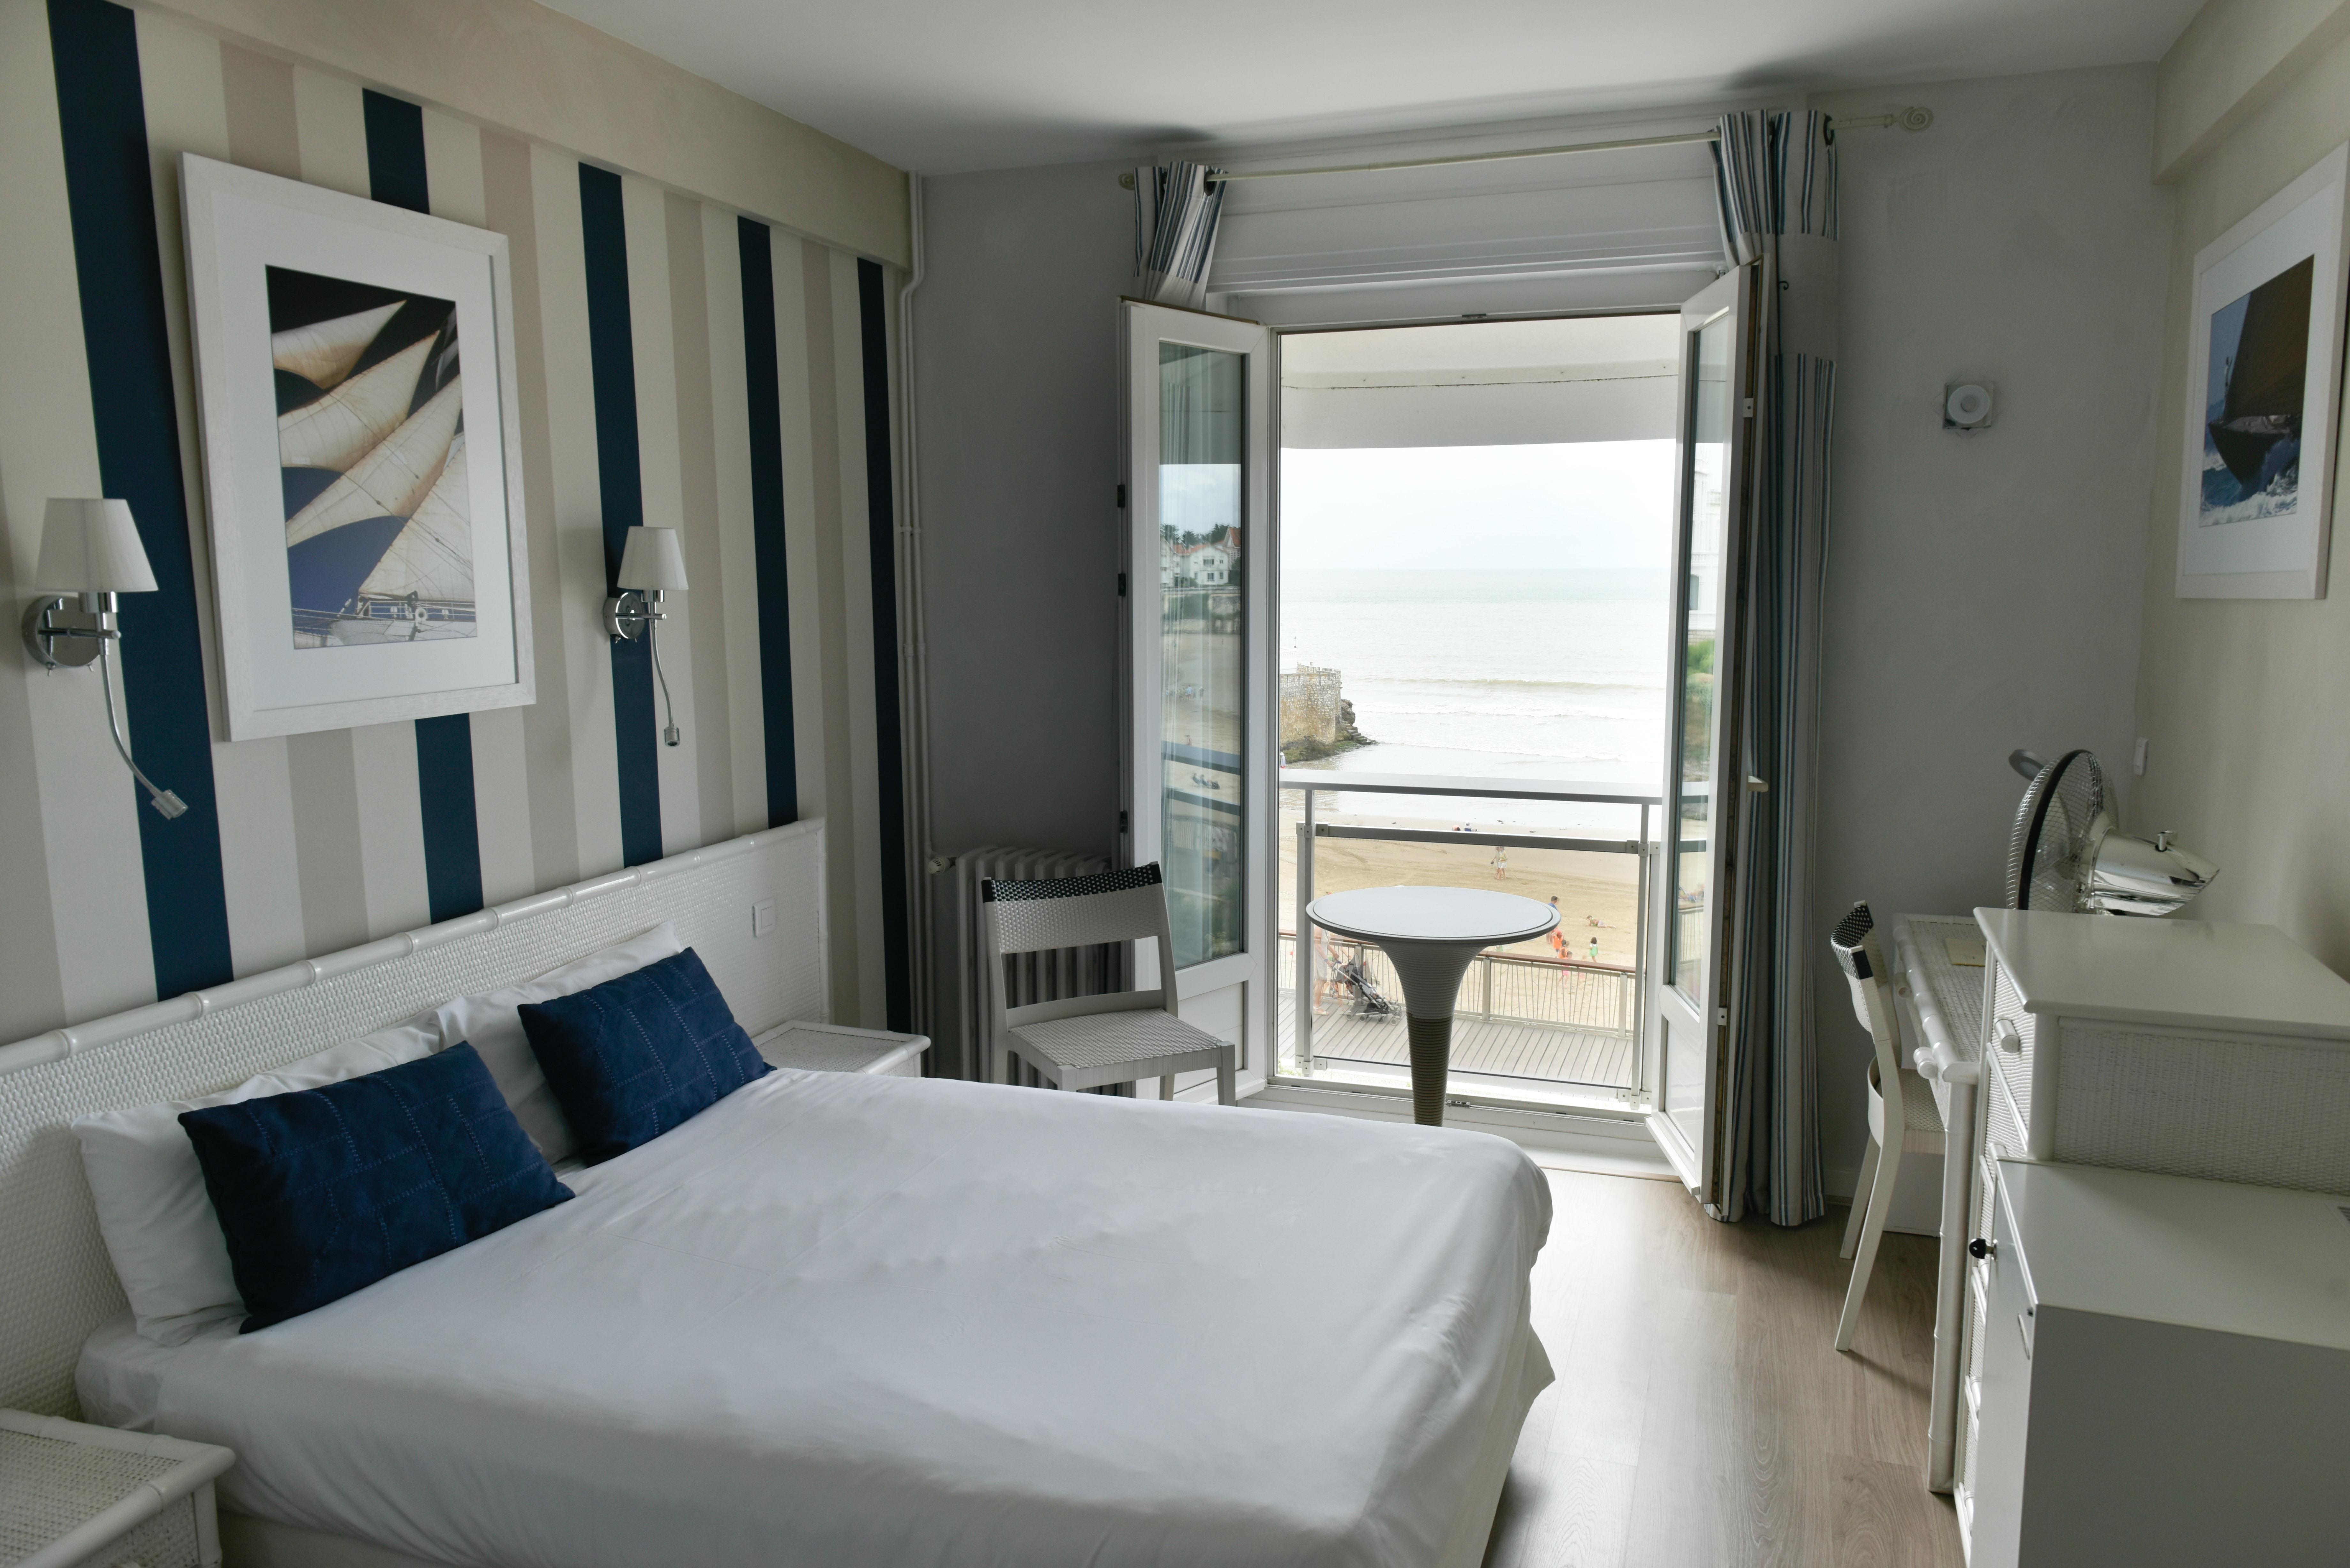 Reserver chambre hotel fabulous htel incroyables qui vous for Reserver une chambre hotel